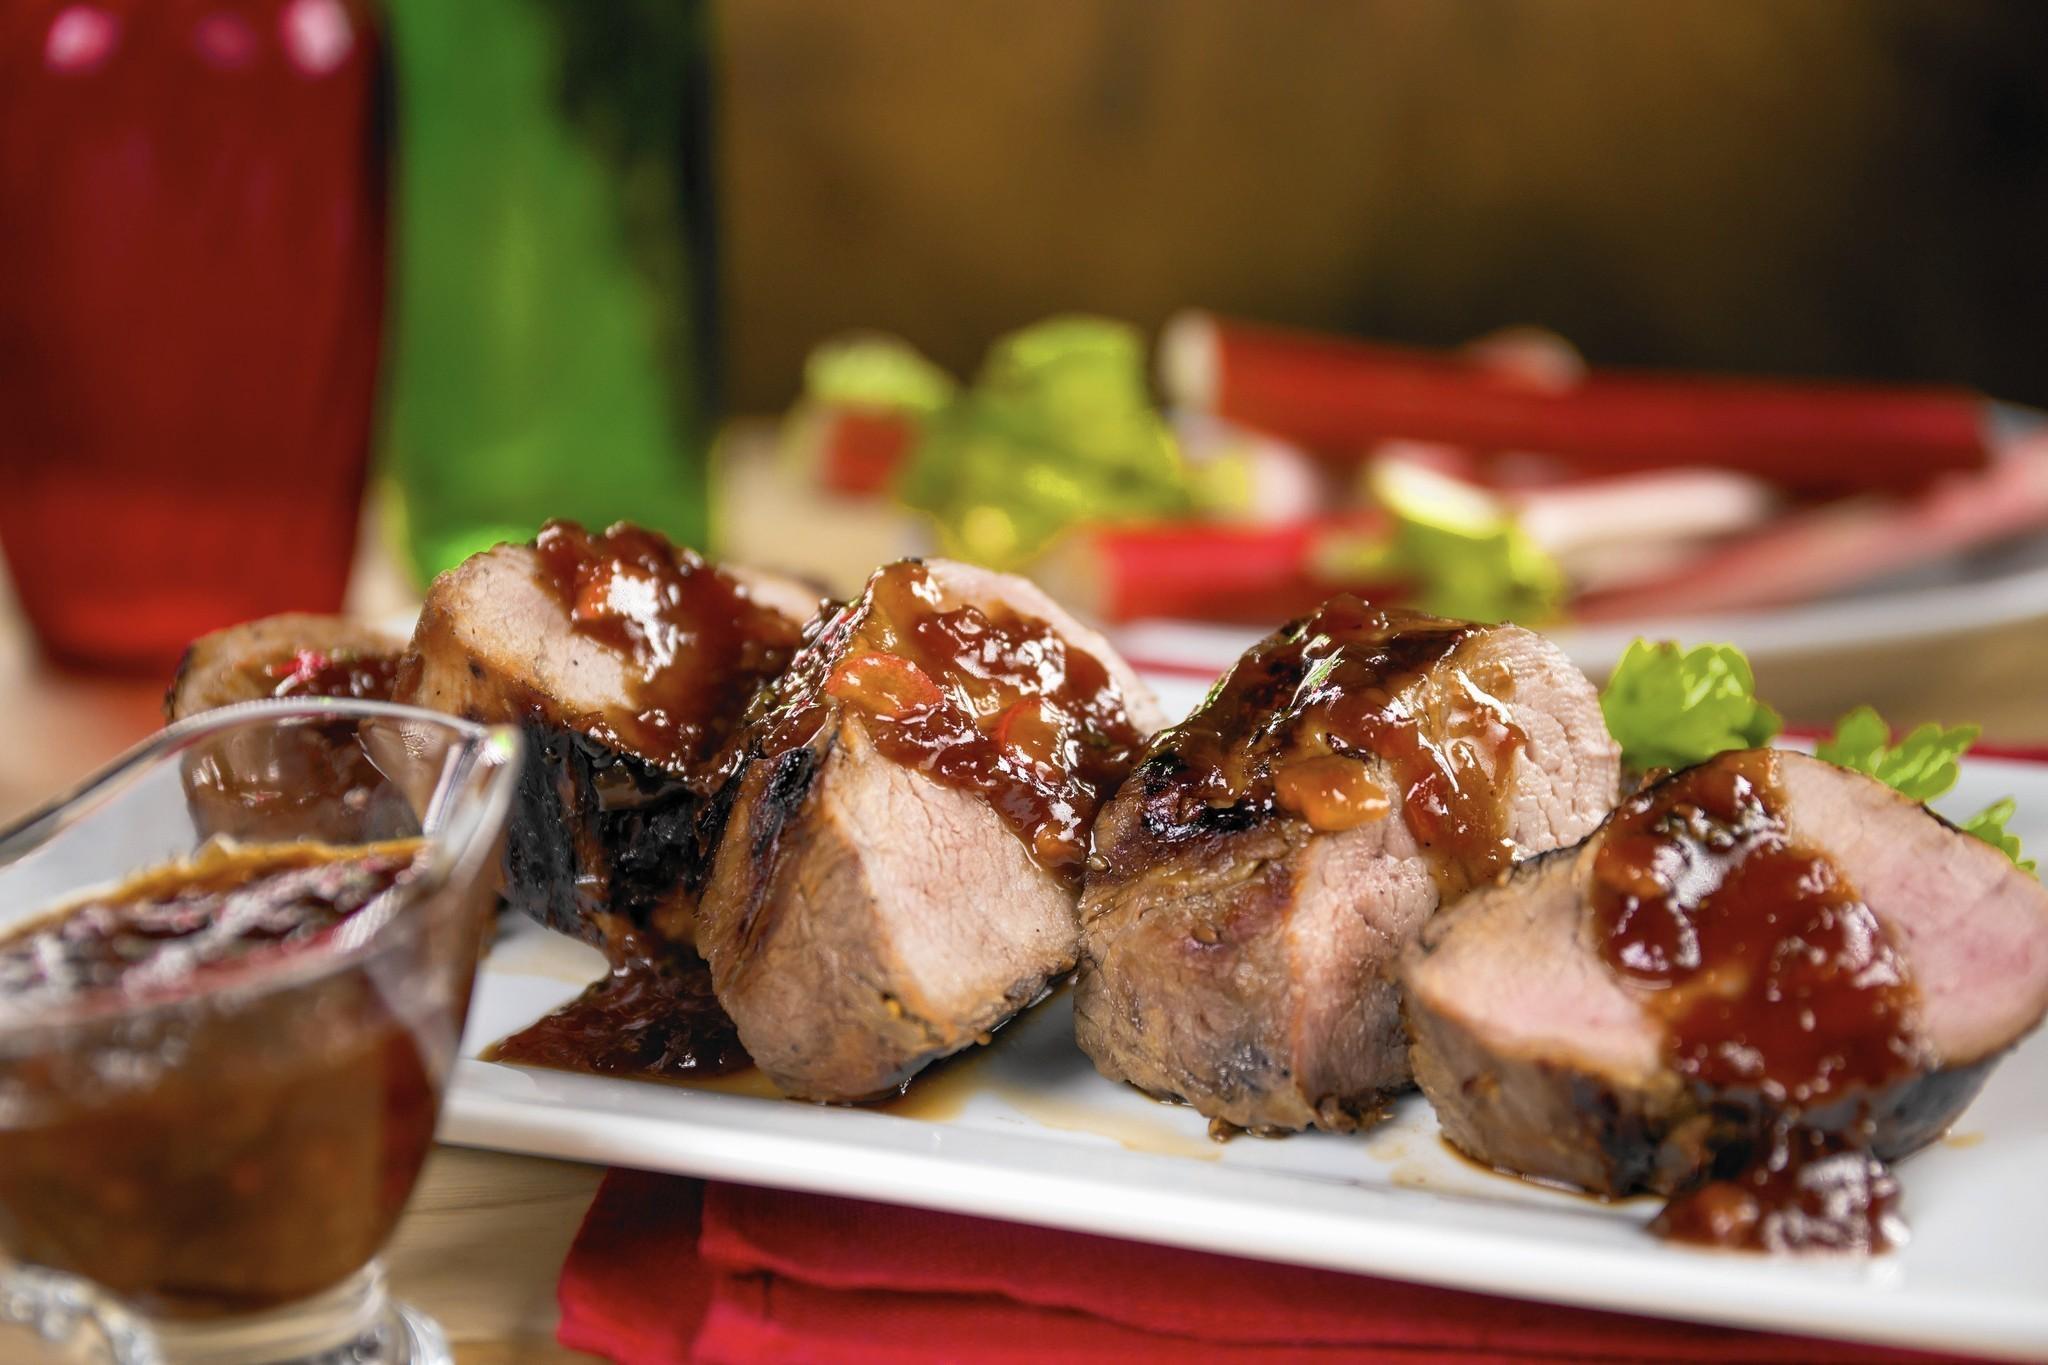 pork tenderloin recipes for grilling the forgotten cut - Chicago ...